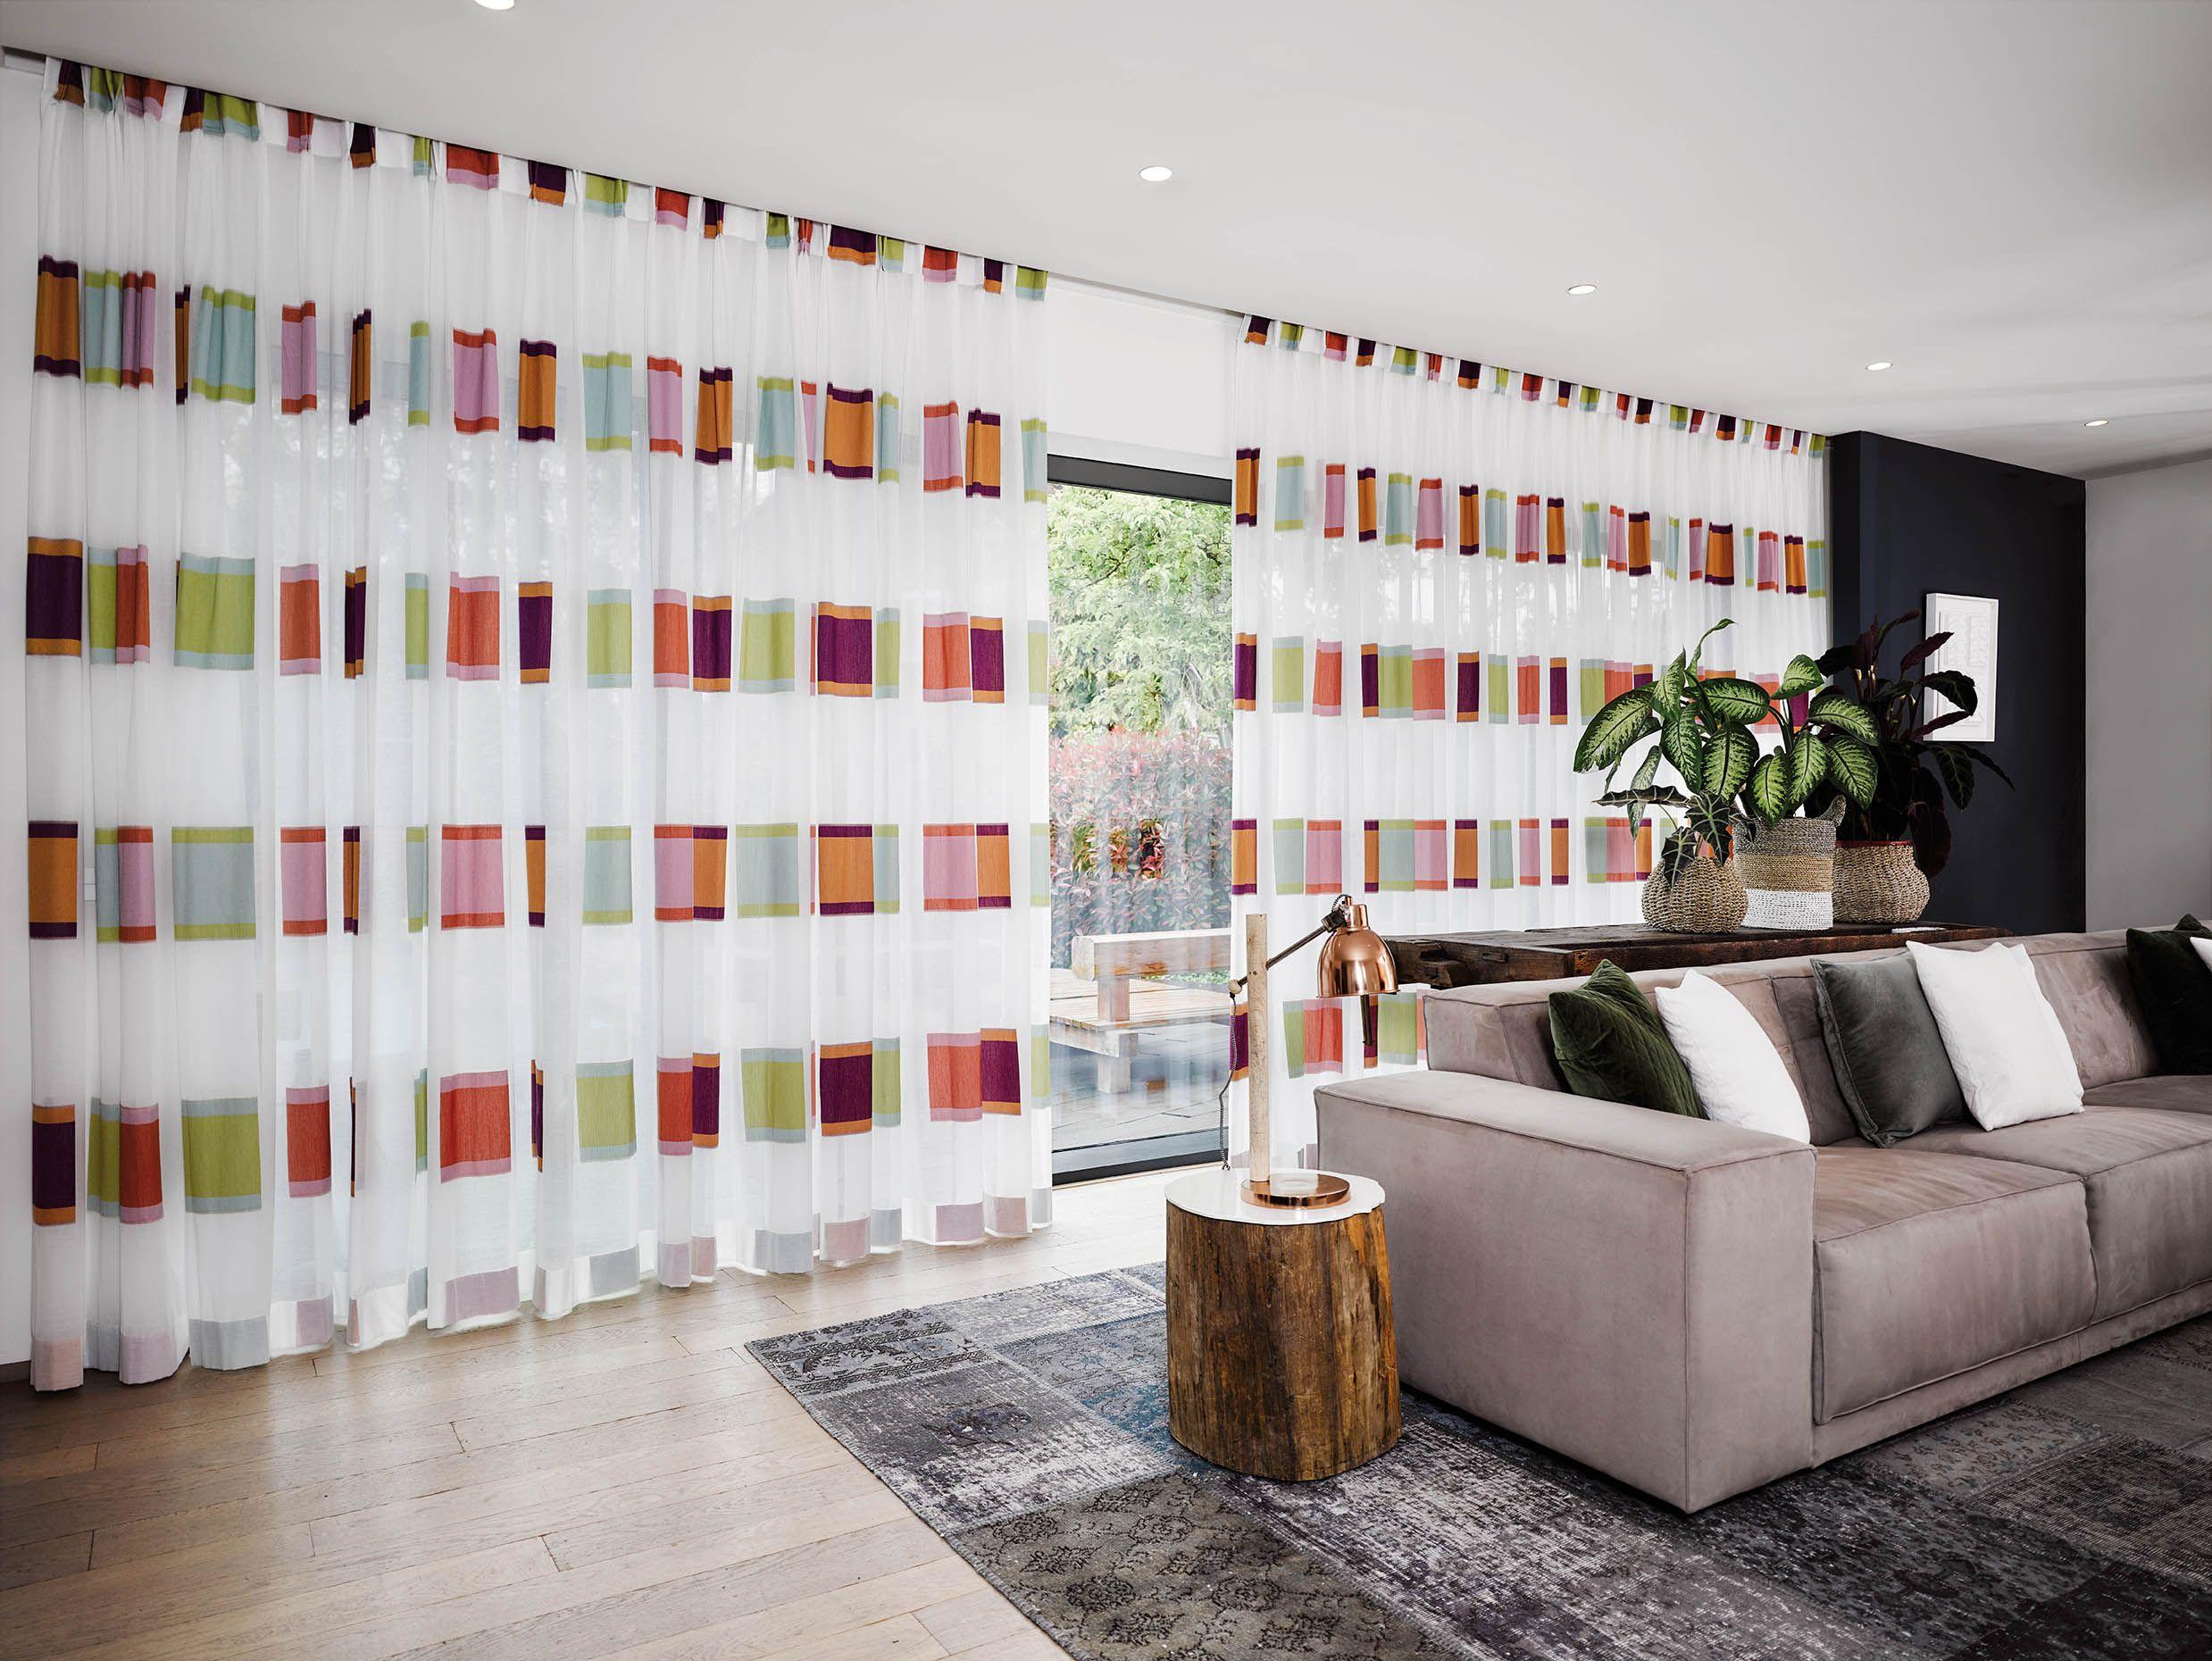 Gordijnen #inbetween #stoffen #interieur #decoratie #bekleding